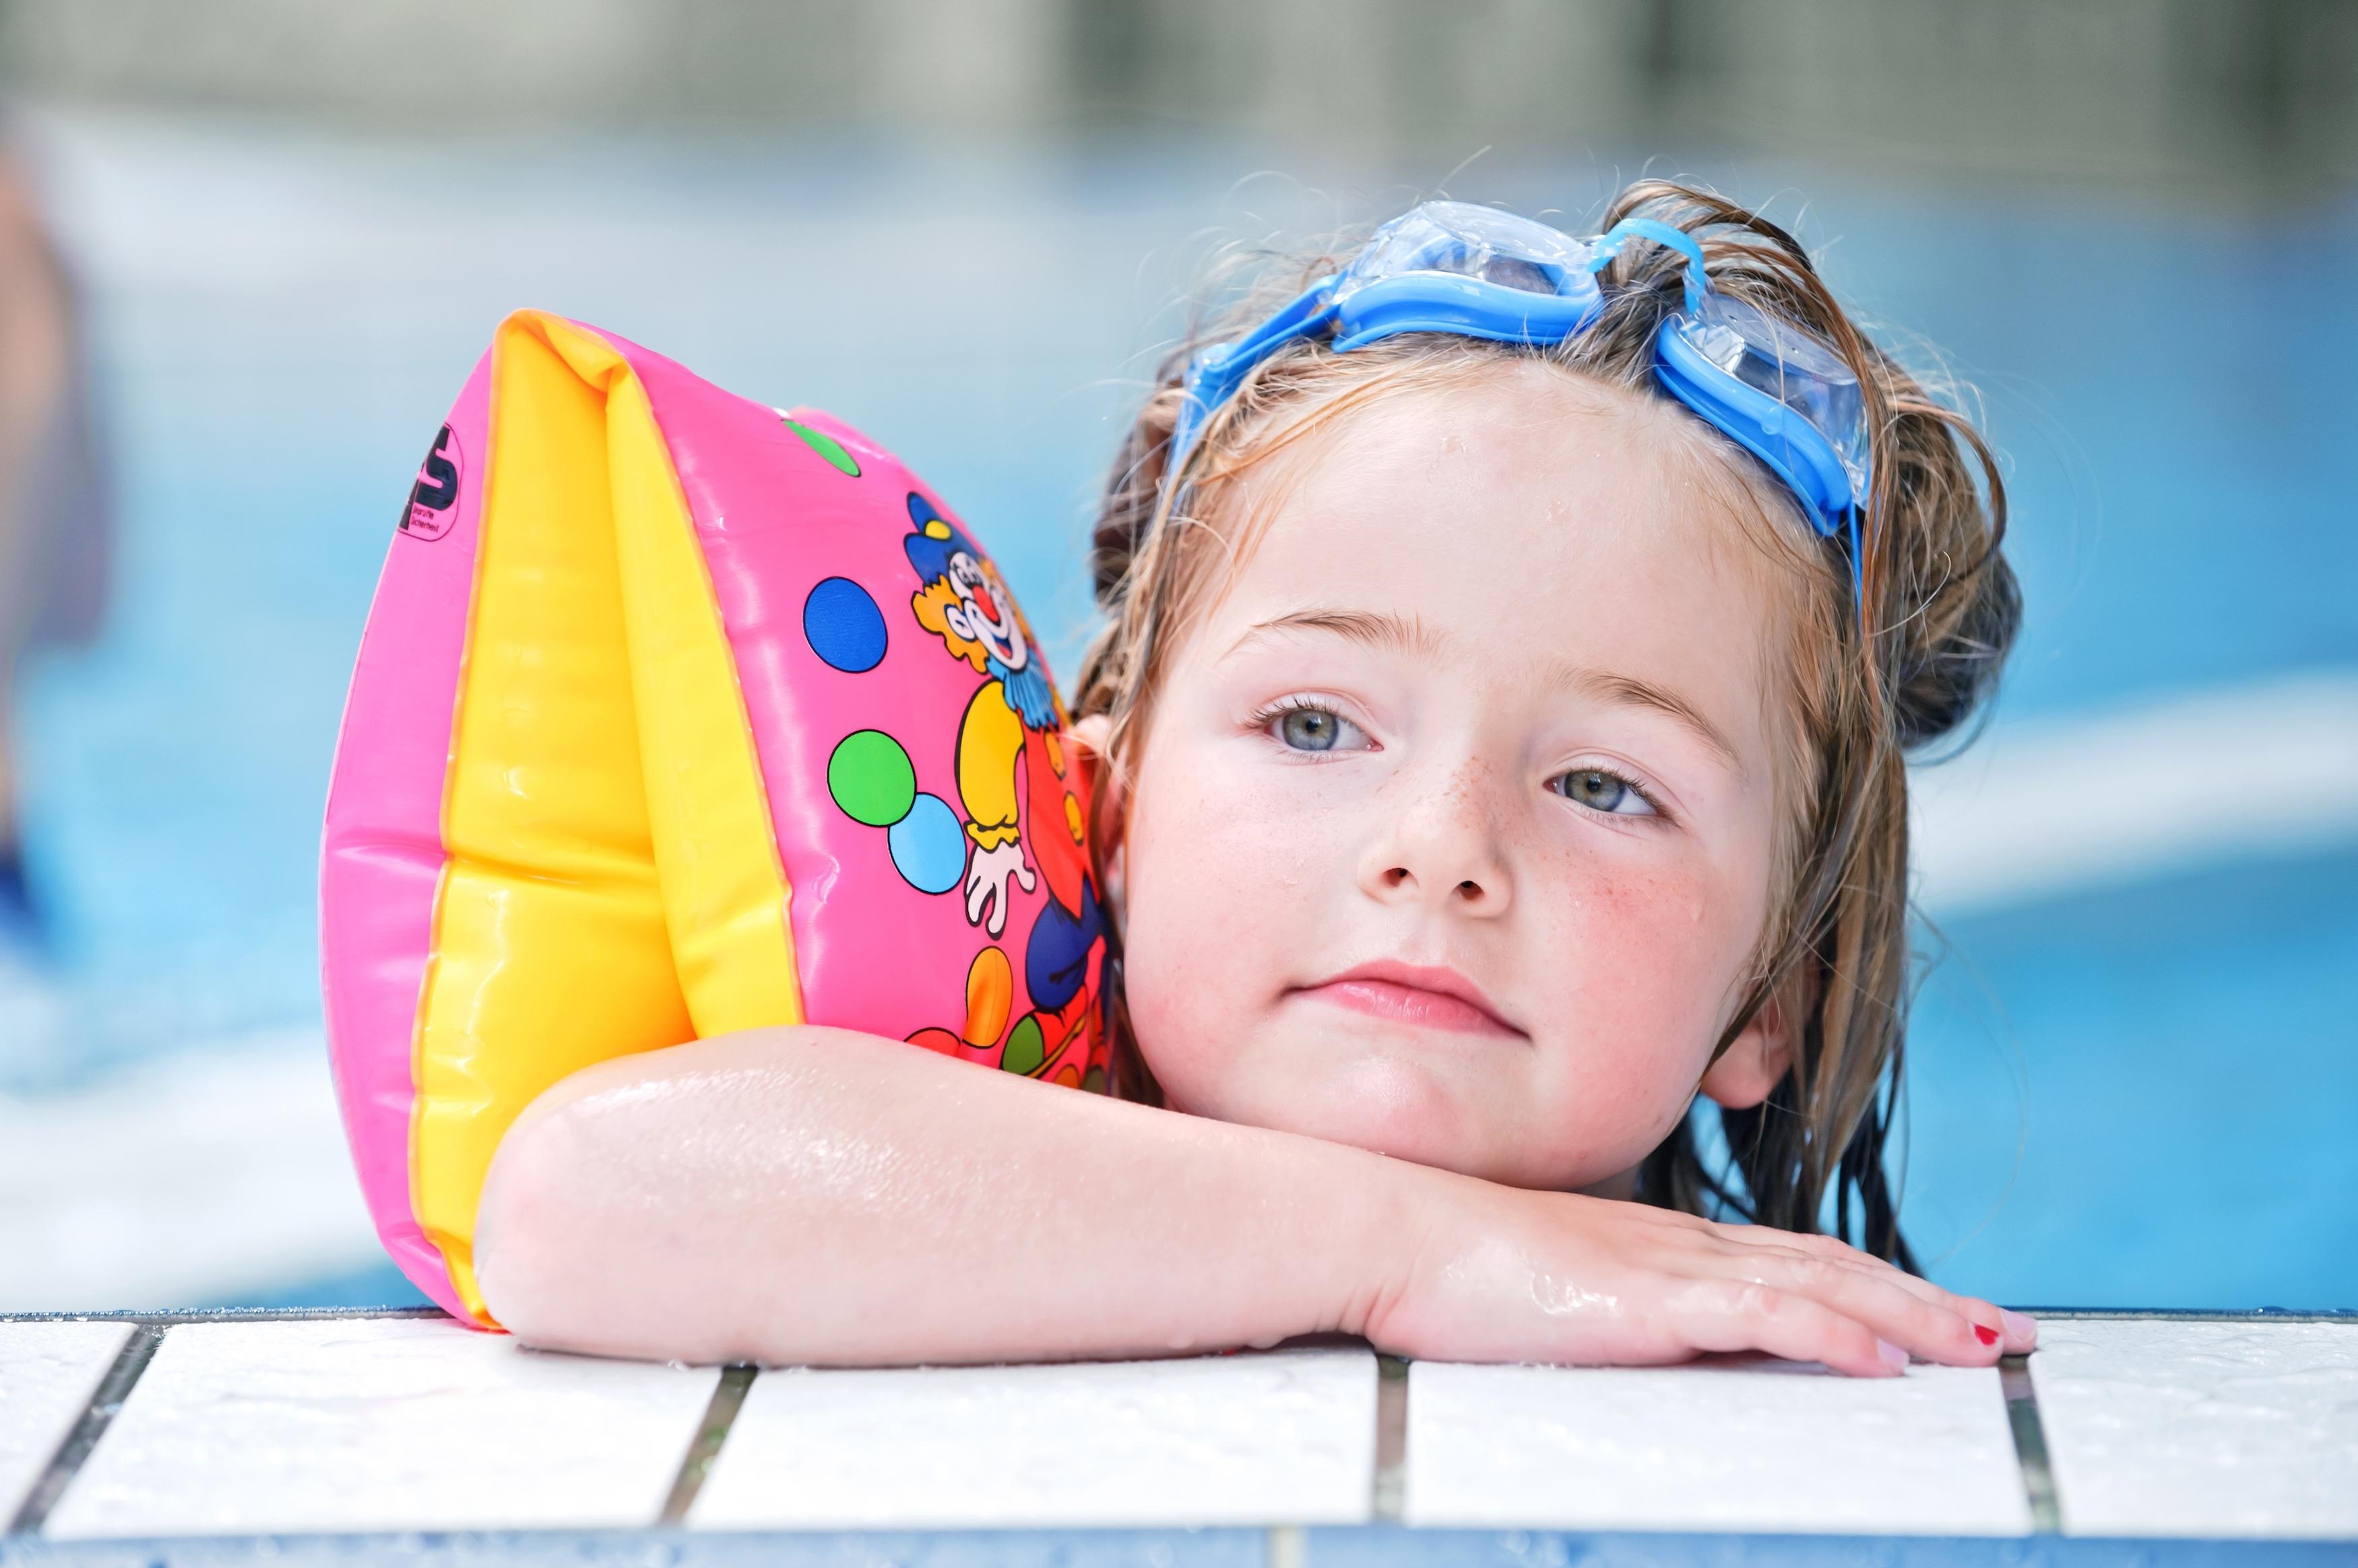 f45be60ec8b1a4661973_f7ae80c40f030c409dad_Swim_Child.jpg